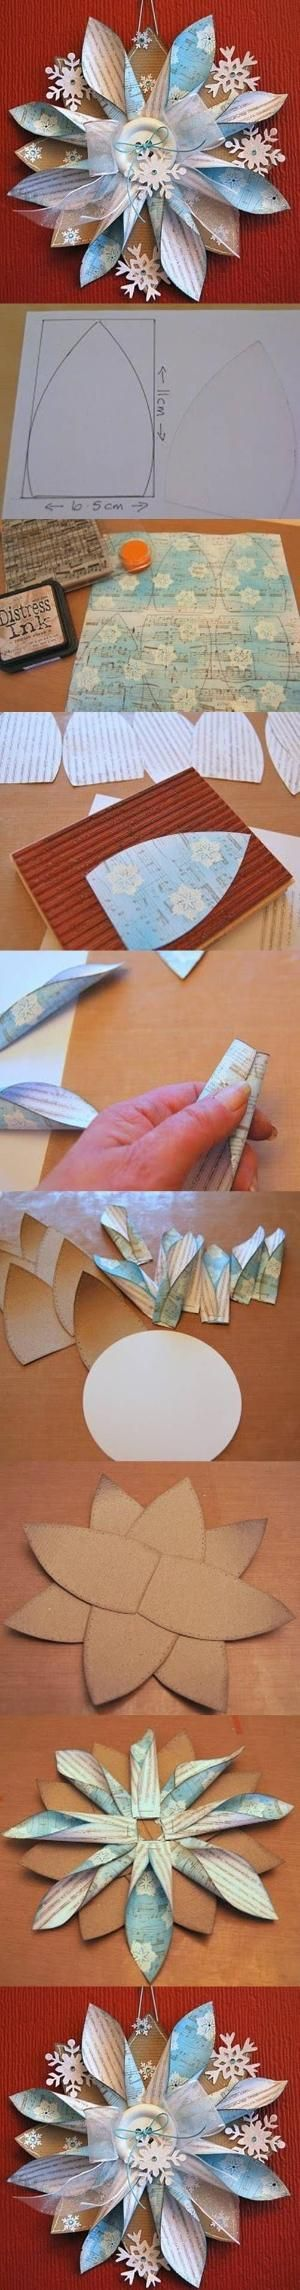 DIY rolled paper flower.